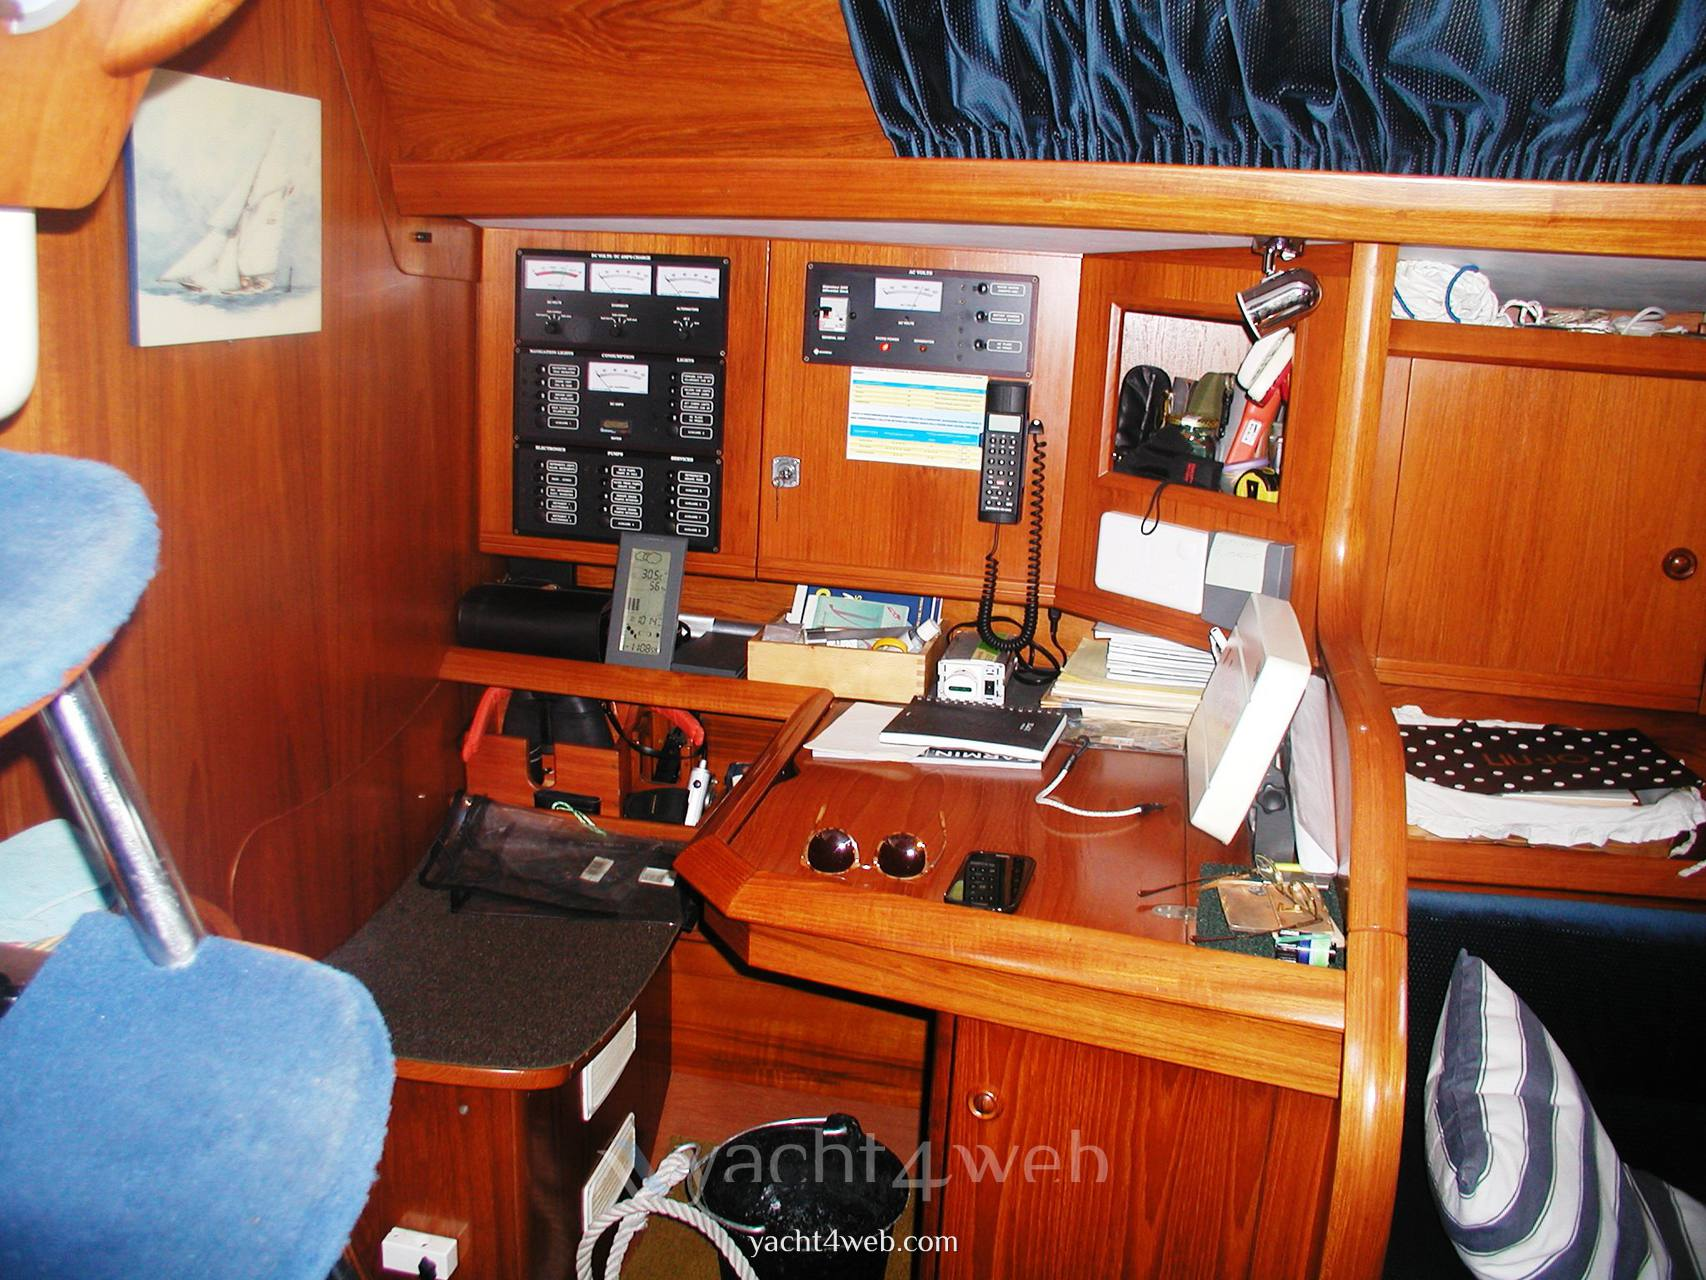 JEANNEAU Sun odyssey 42cc Barca a vela usata in vendita